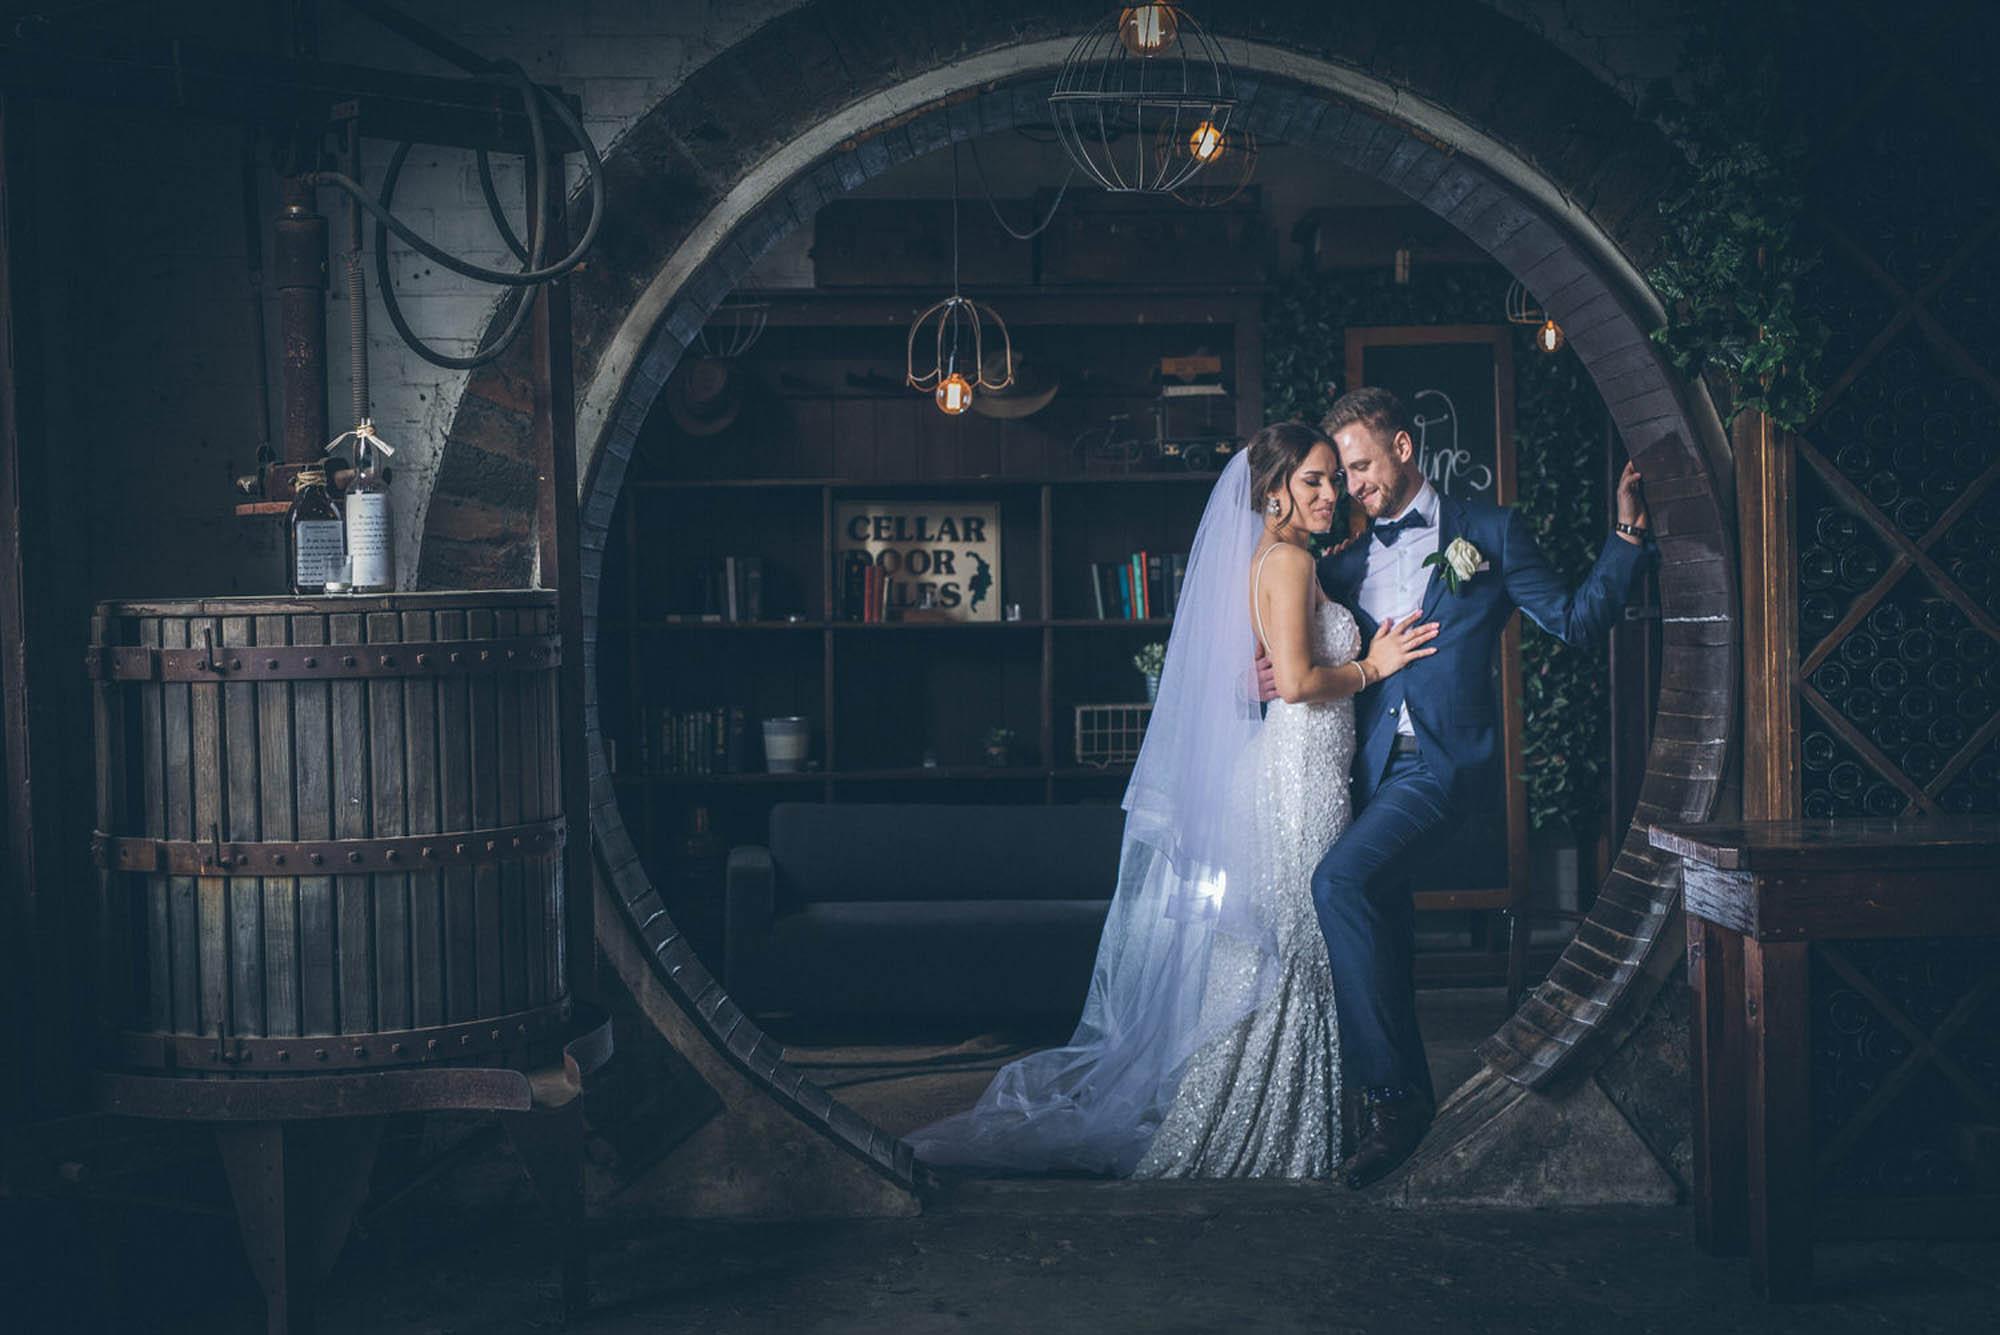 MacDougall-Photography-Sydney-Wedding-Photographers-67.jpg